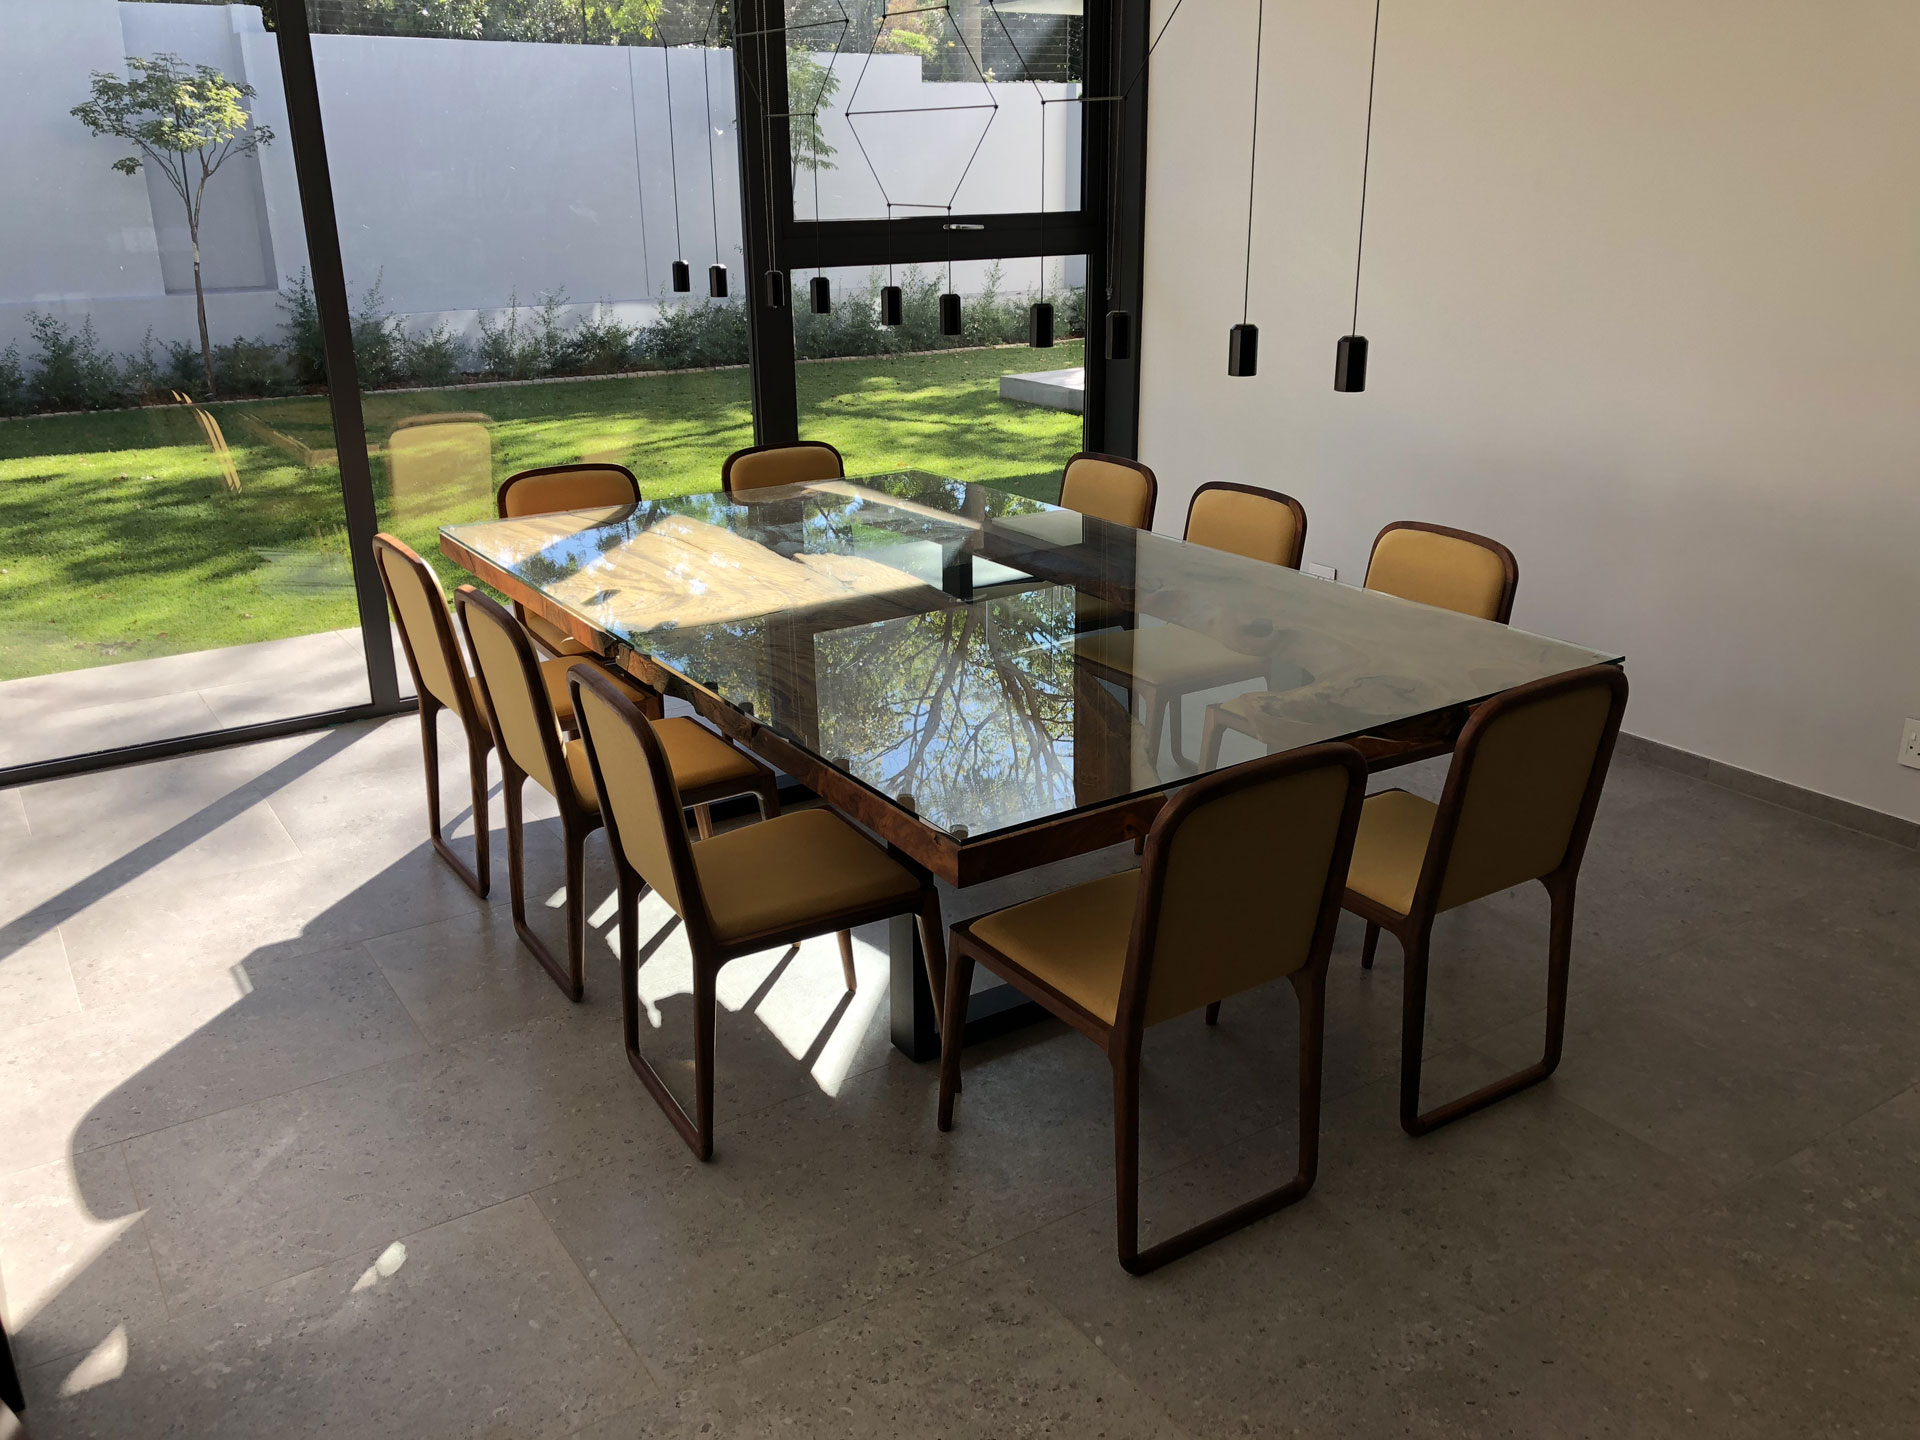 Home   Original furniture with a natural edge